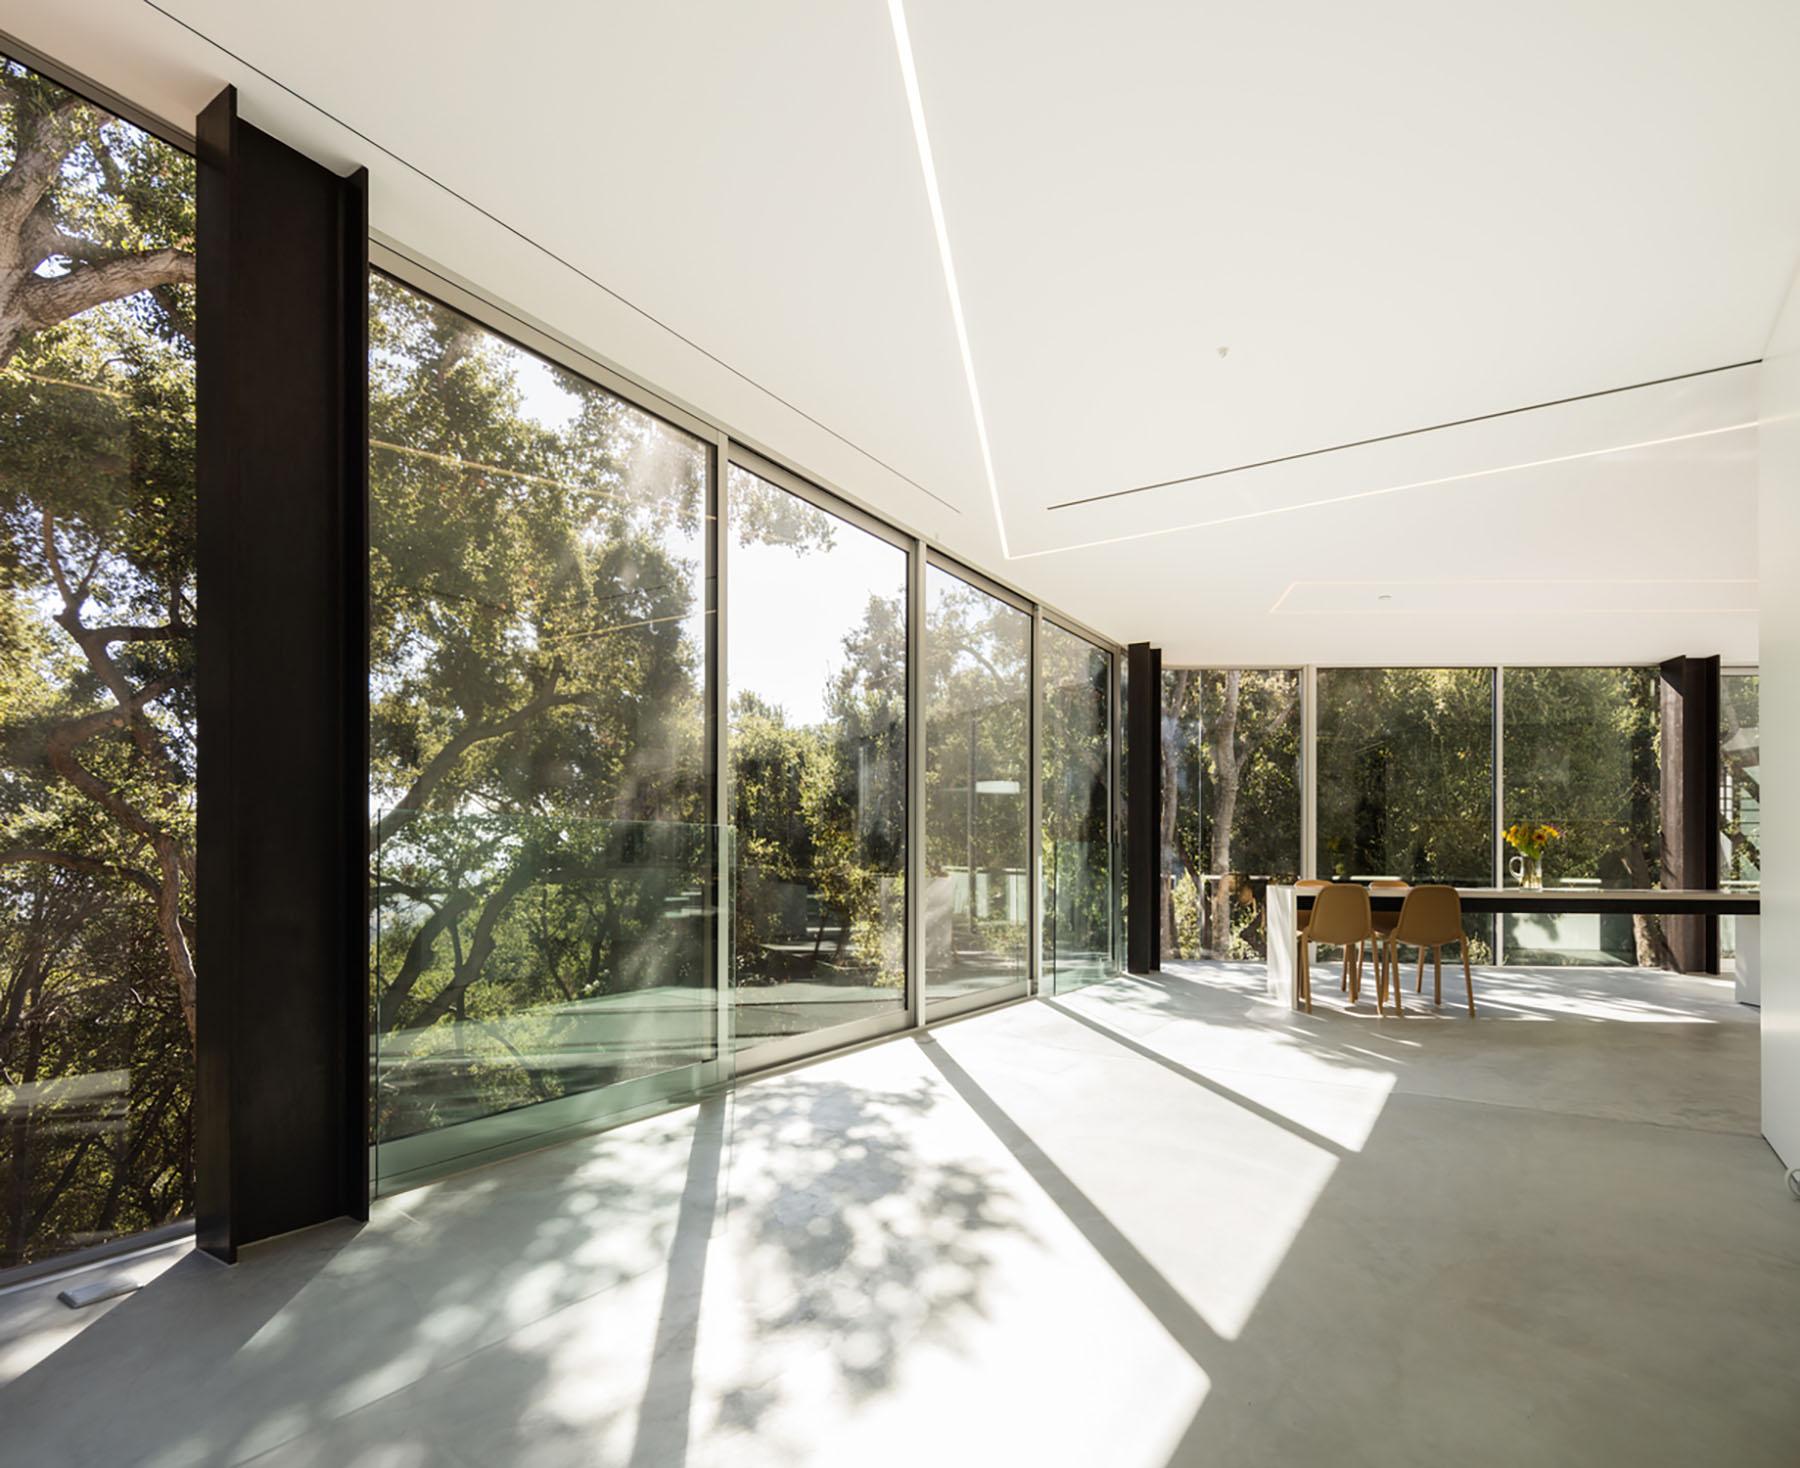 iGNANT-Architecture-Craig-Steely-Pam-Pauls-House-009b